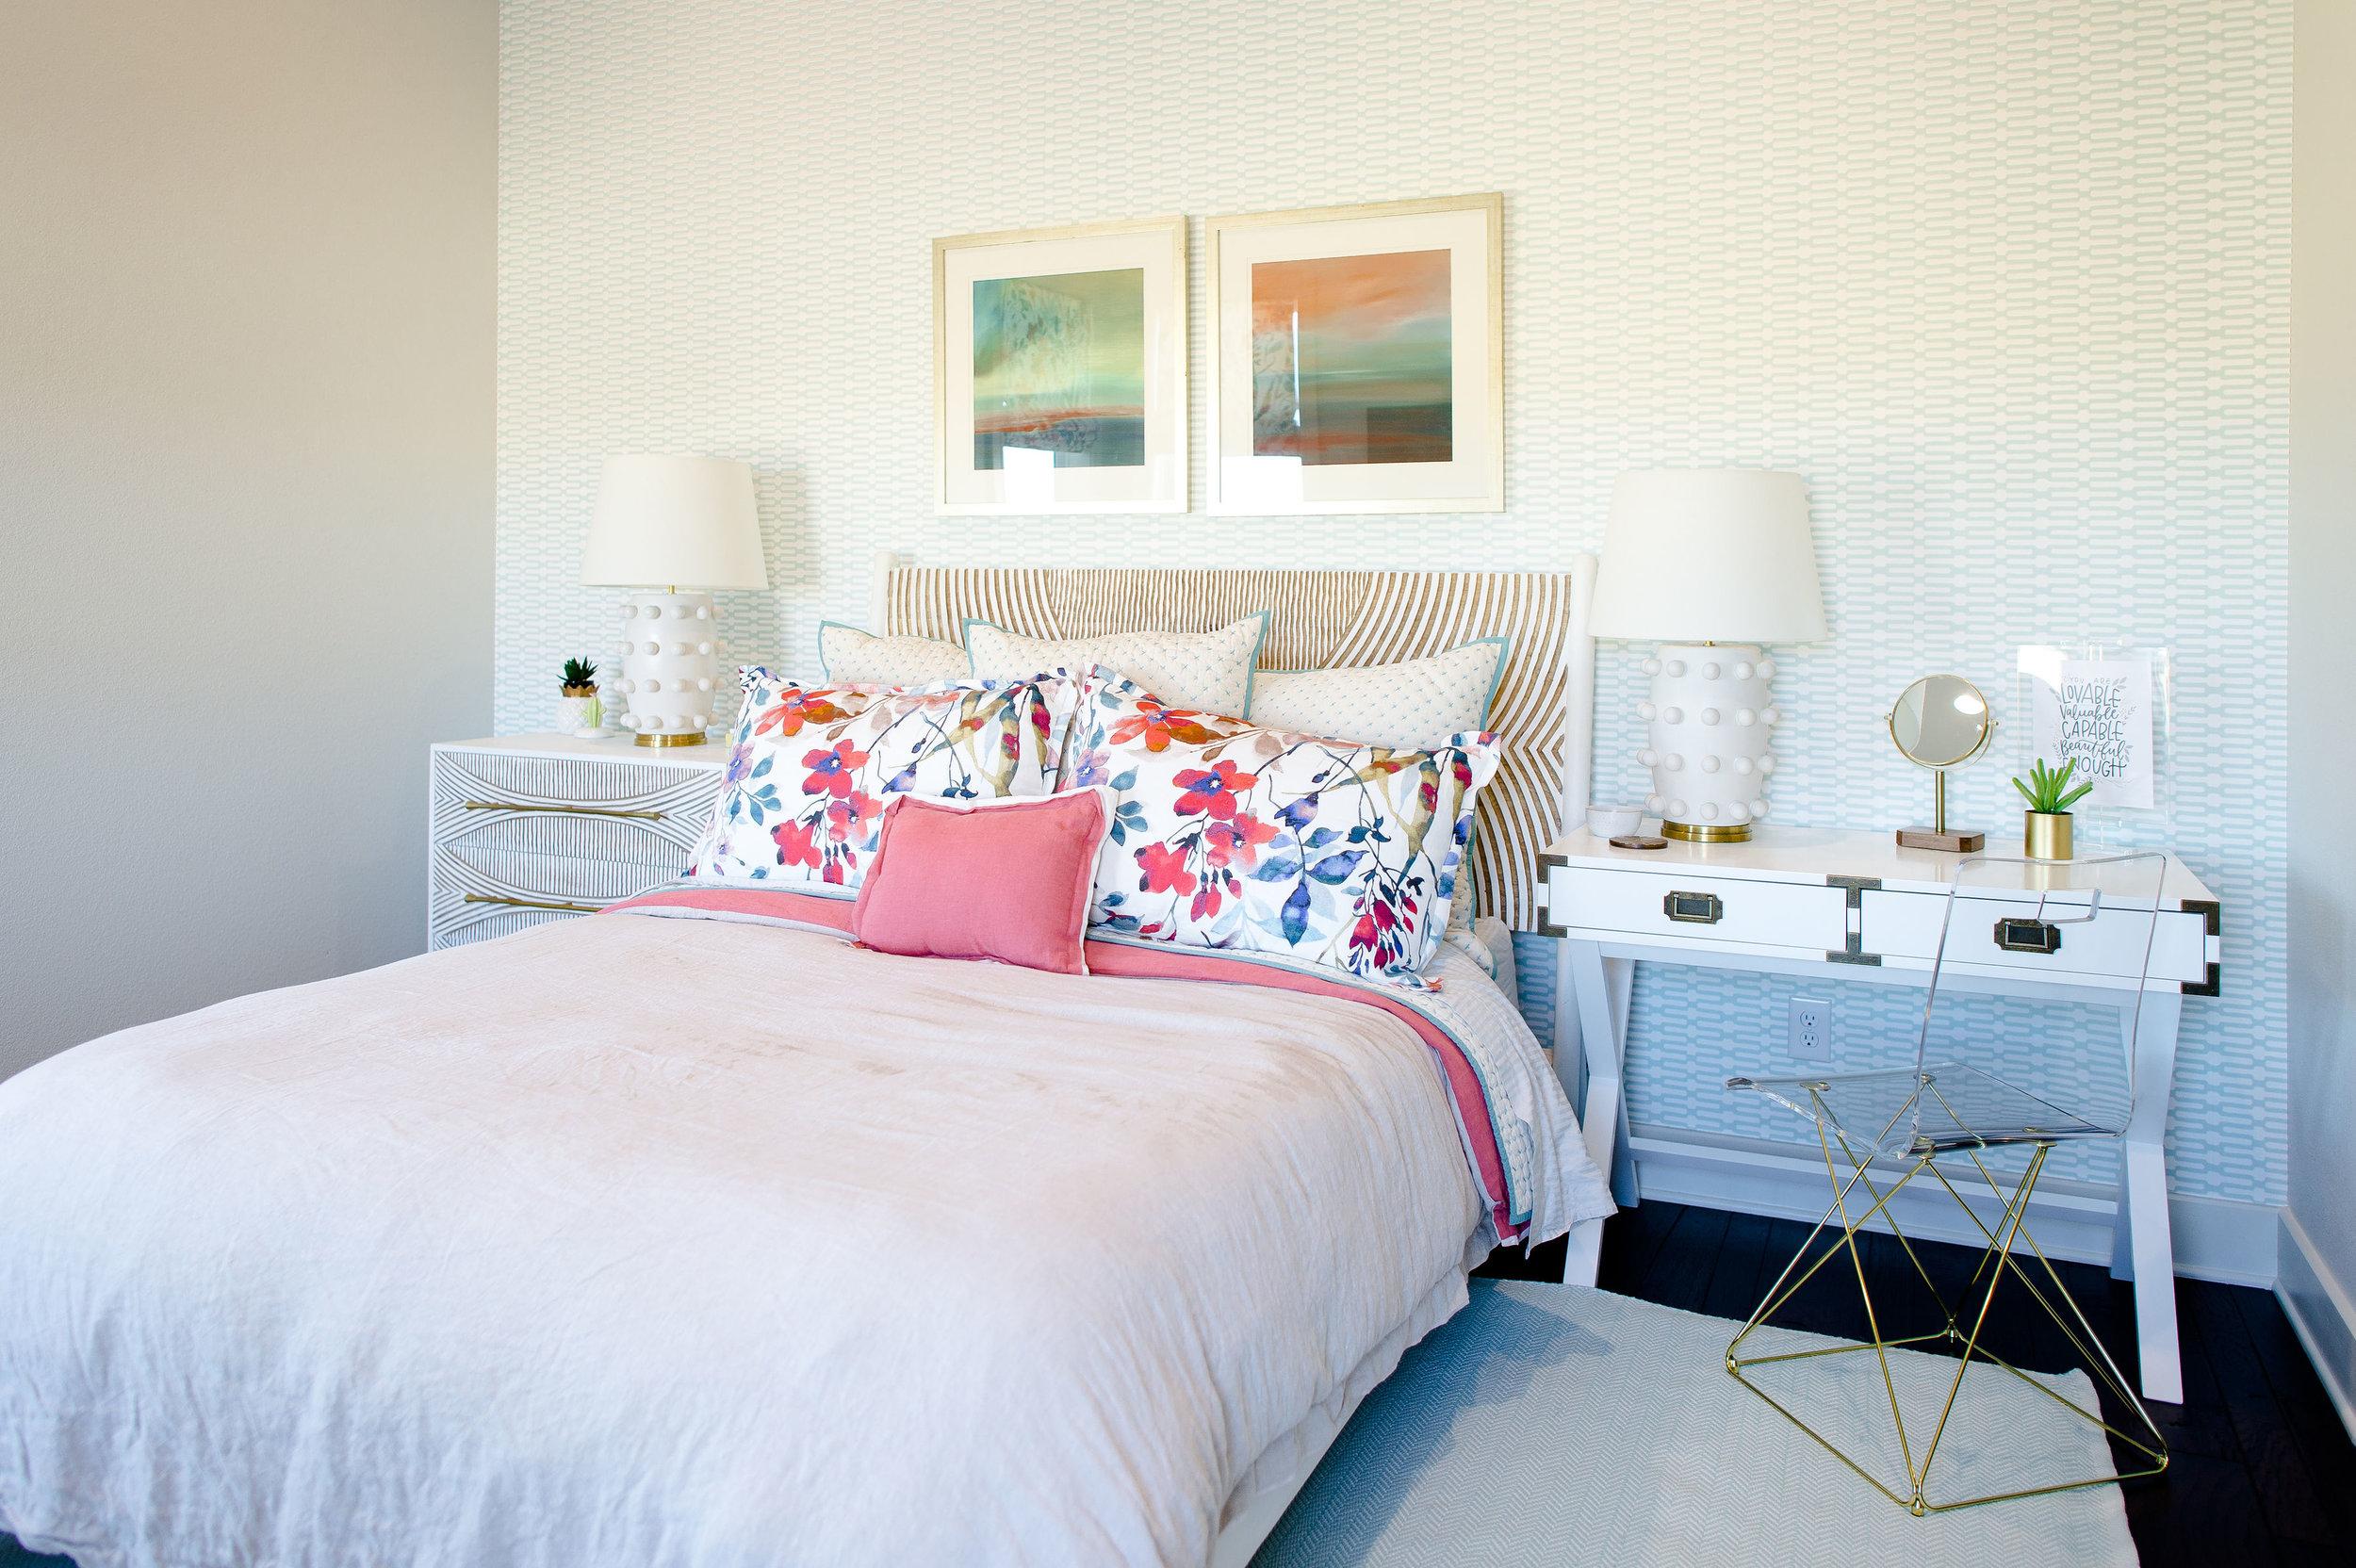 hill-country-transitional-clark-design-studio-wichita-falls-tx-girls-bedroom-anne-selke.jpg